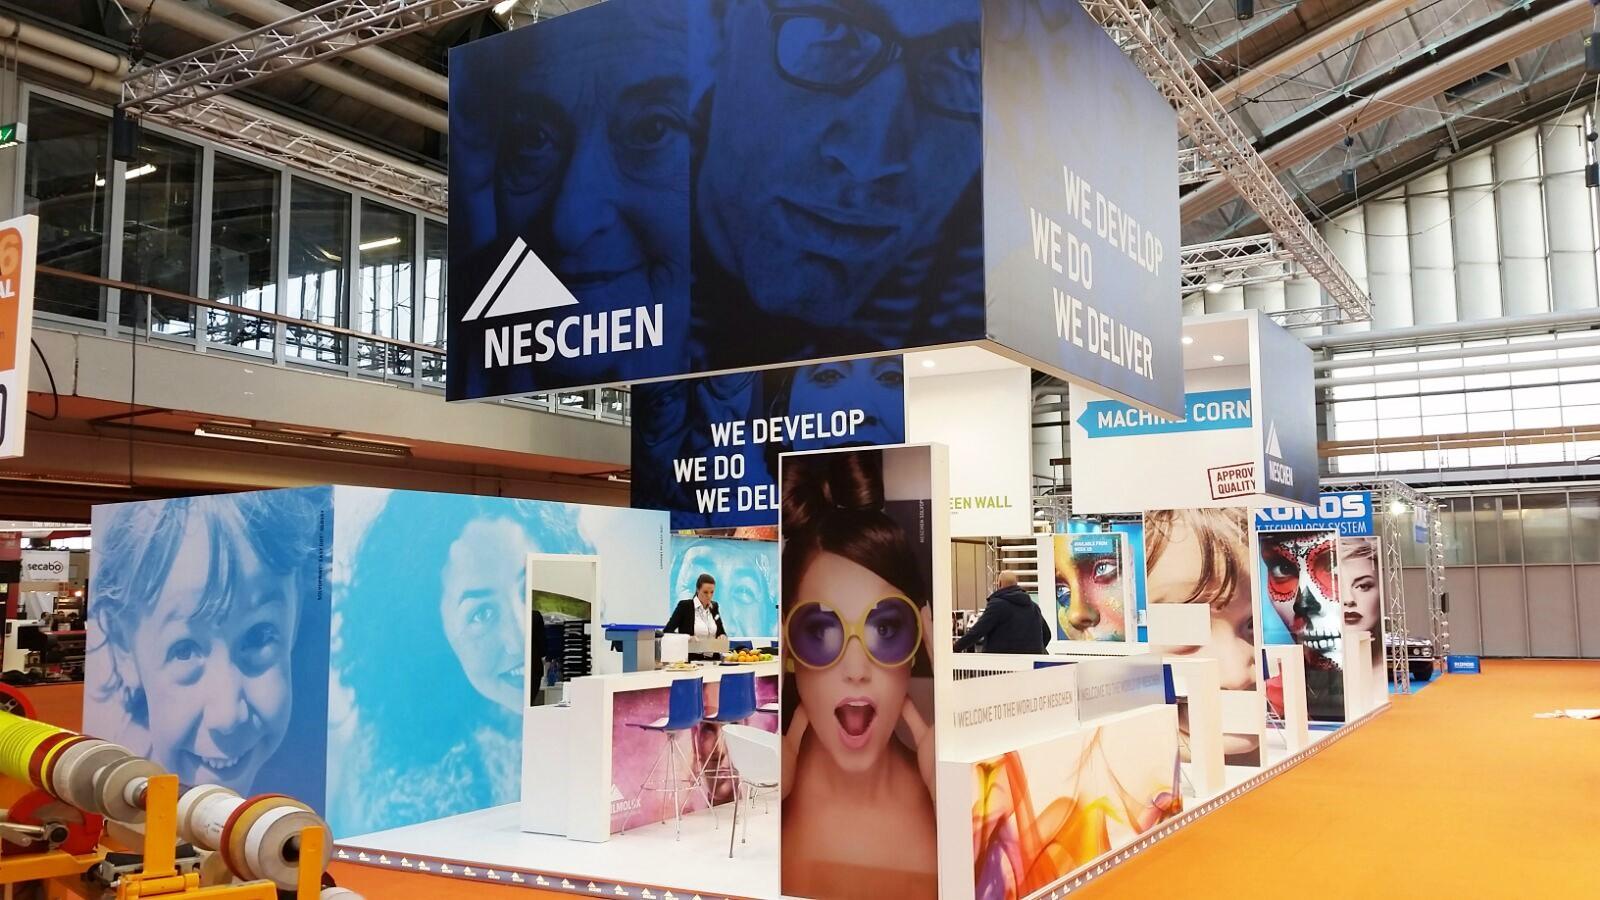 Neschen@ Fespa 2016 in Amsterdam